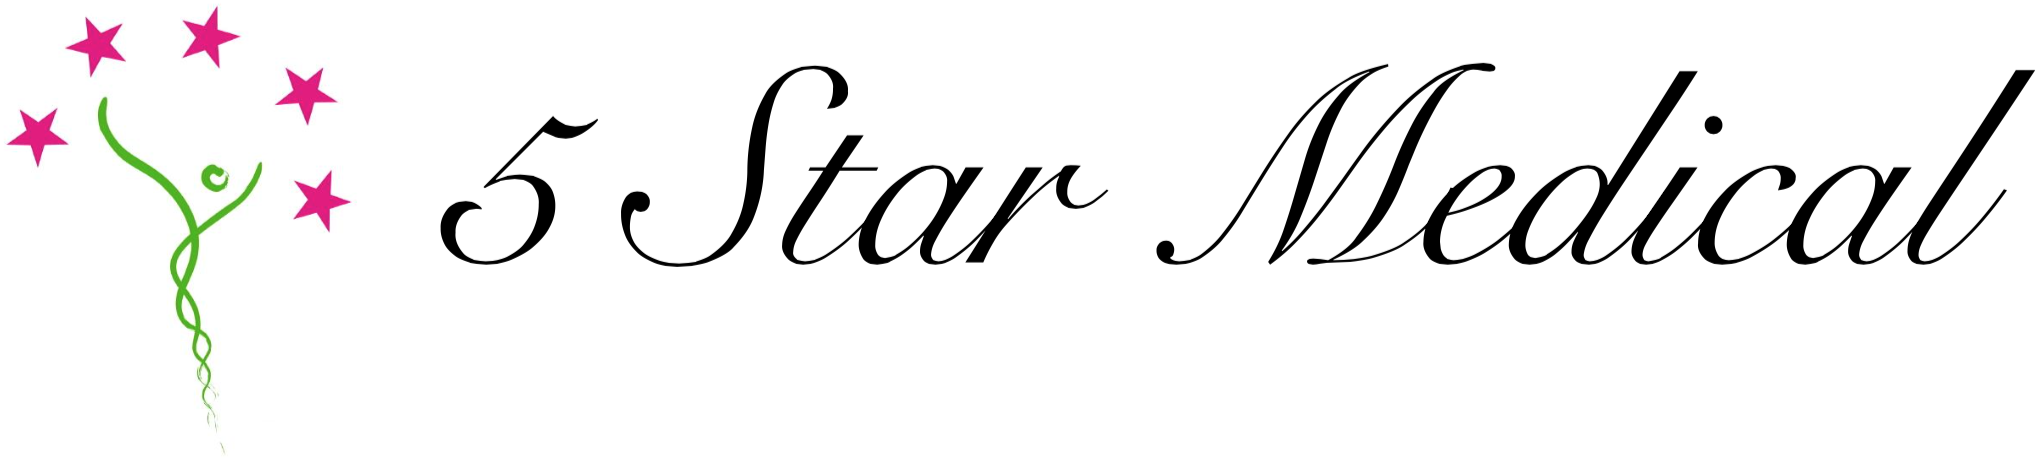 5 Star Medical